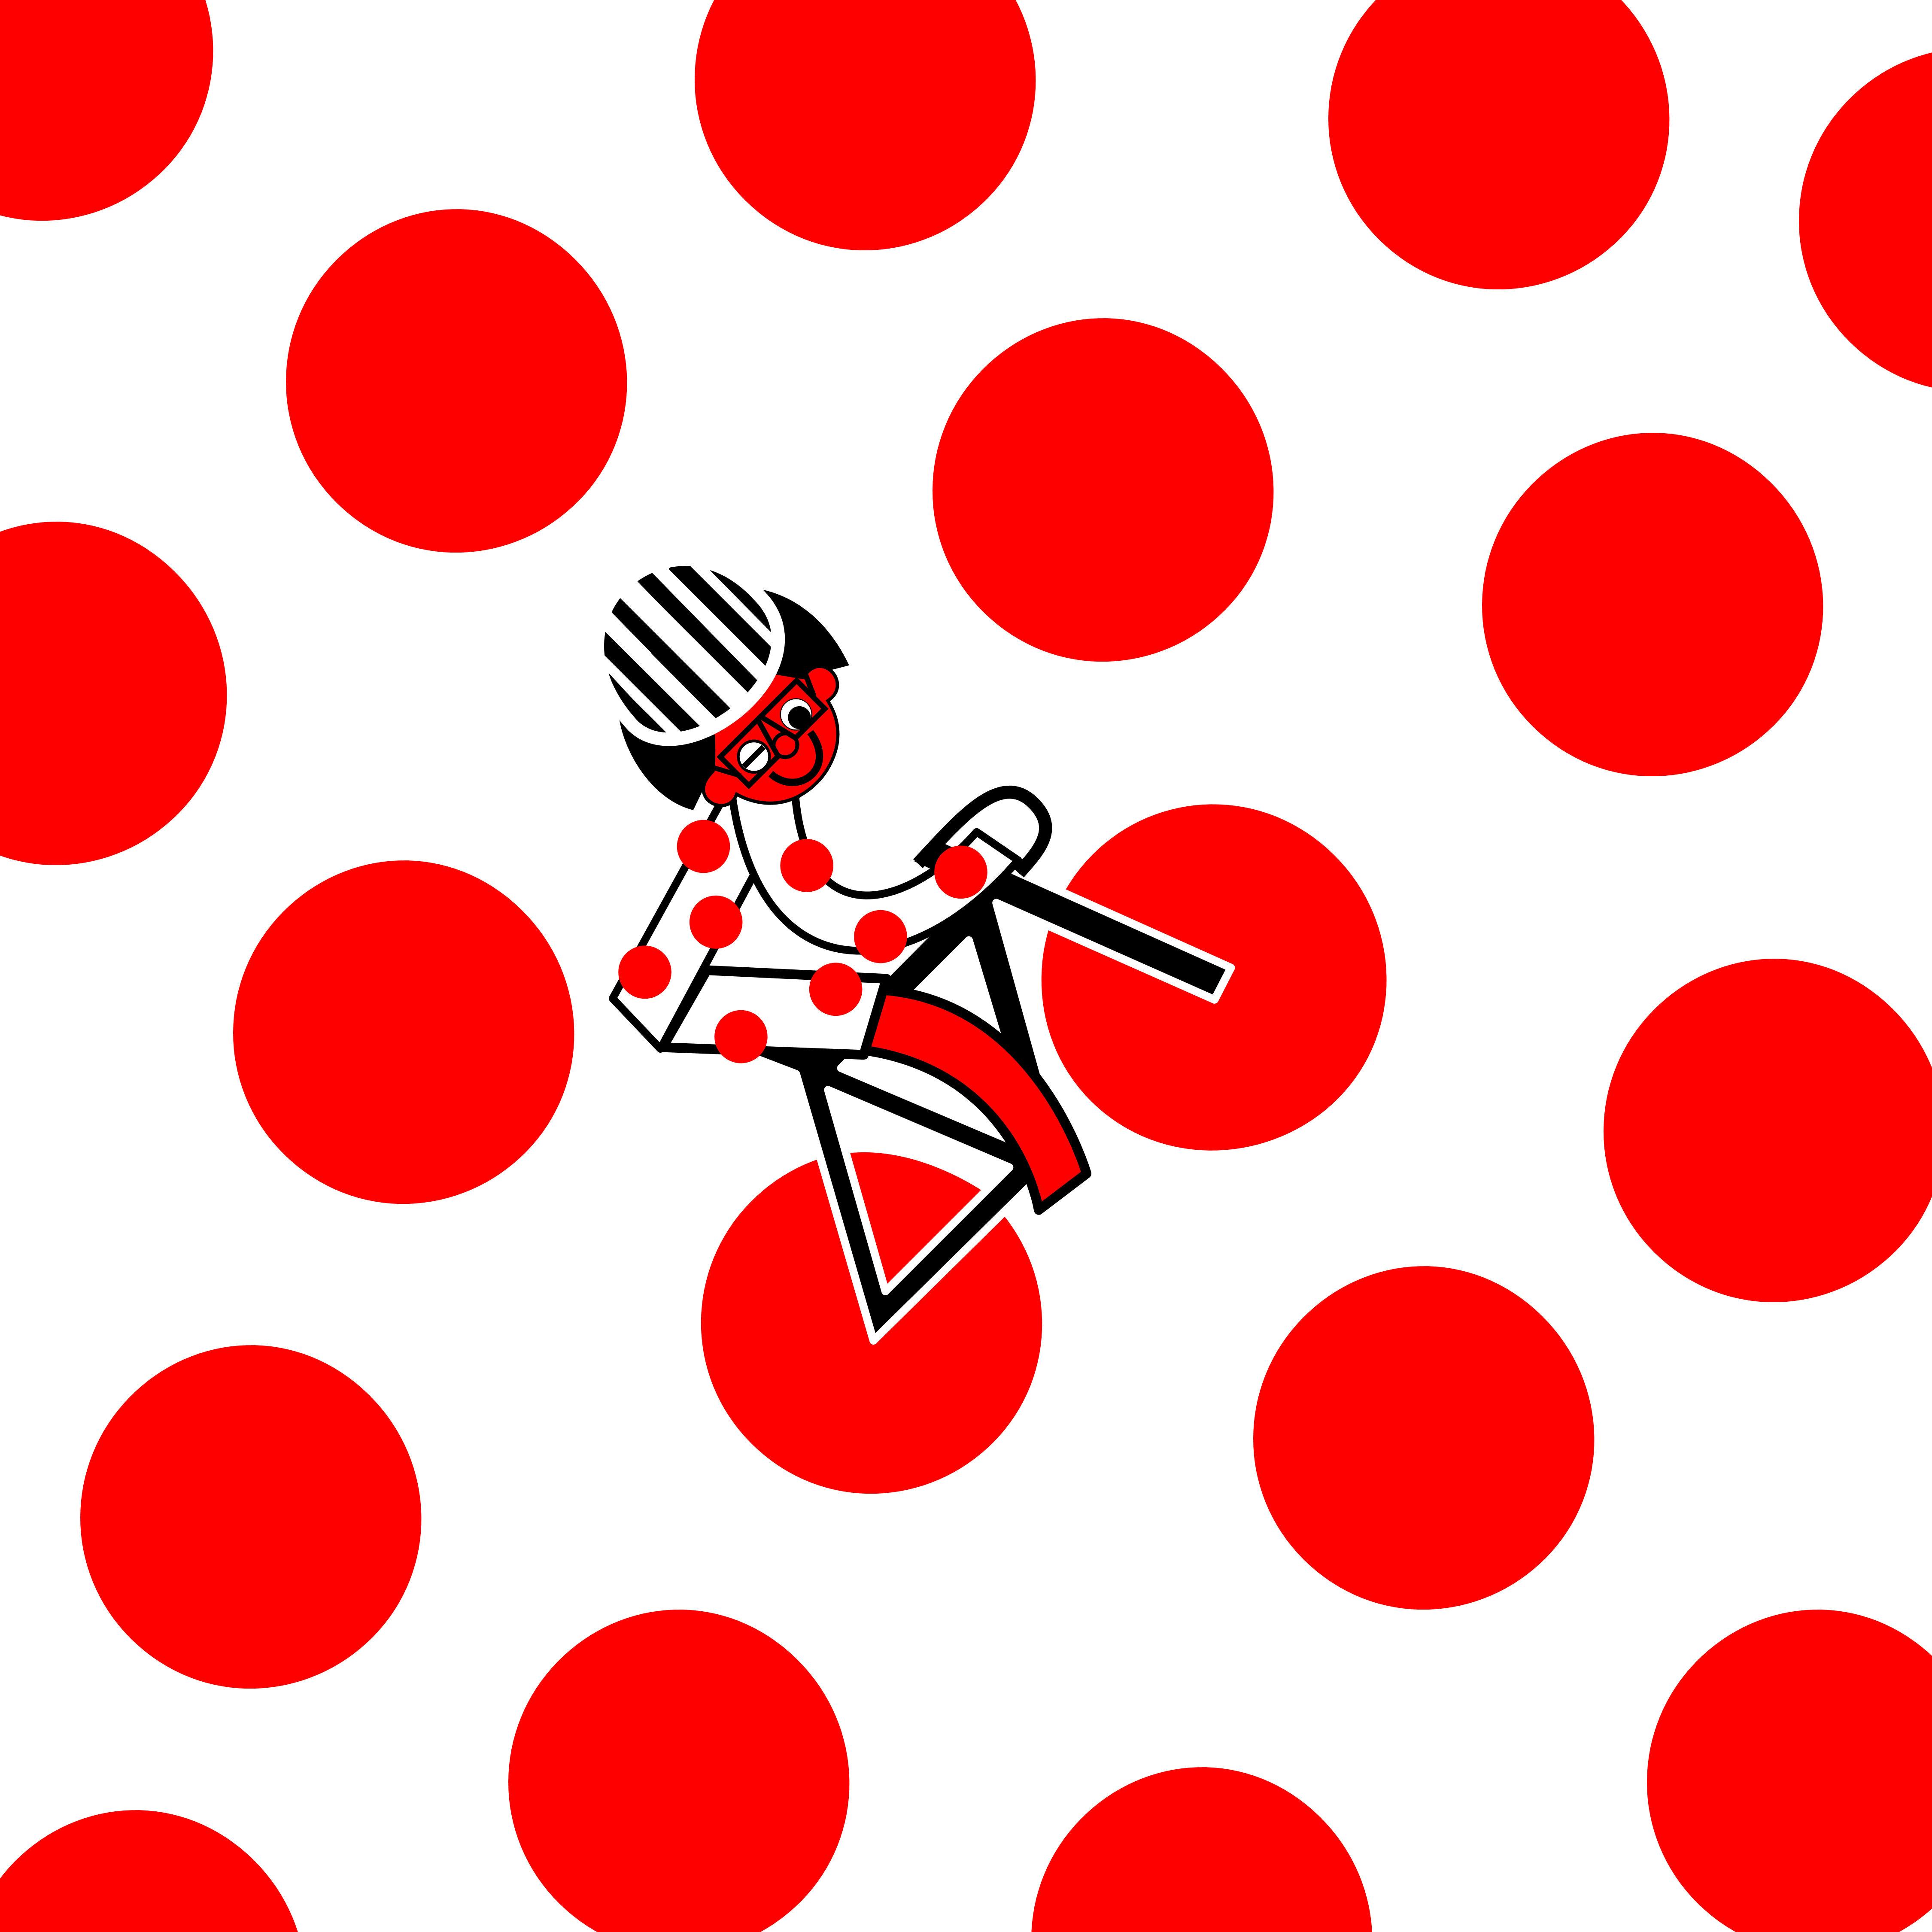 Saint-Gaudens, Saint-Lary Pla                                 d'Adet, Majka, Tinkoff Saxo, Polka dot,                                 stage 17, July 23rd, Tour de France                                 2014, Tour de France, Saint-Gaudens,                                 Saint-Lary Pla d'Adet, Majka, Tinkoff                                 Saxo, à pois, étape 17, le 23 Juillet,                                 Tour de France 2014, Tour de France